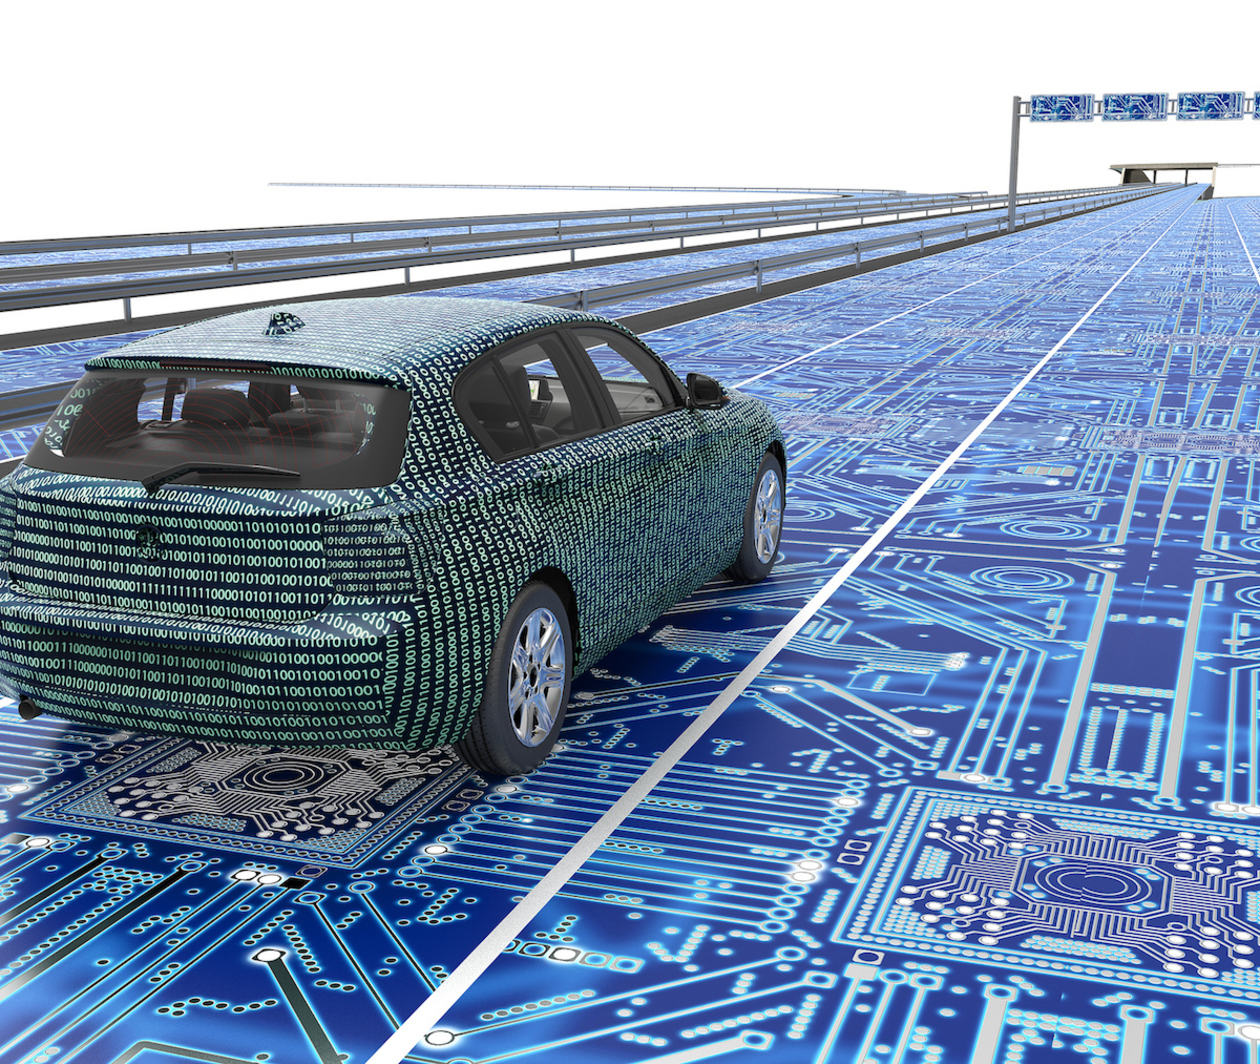 SIT740.3: Intelligent Transport Systems (ITS) and Connected Autonomous Vehicles (CAVs) R&D